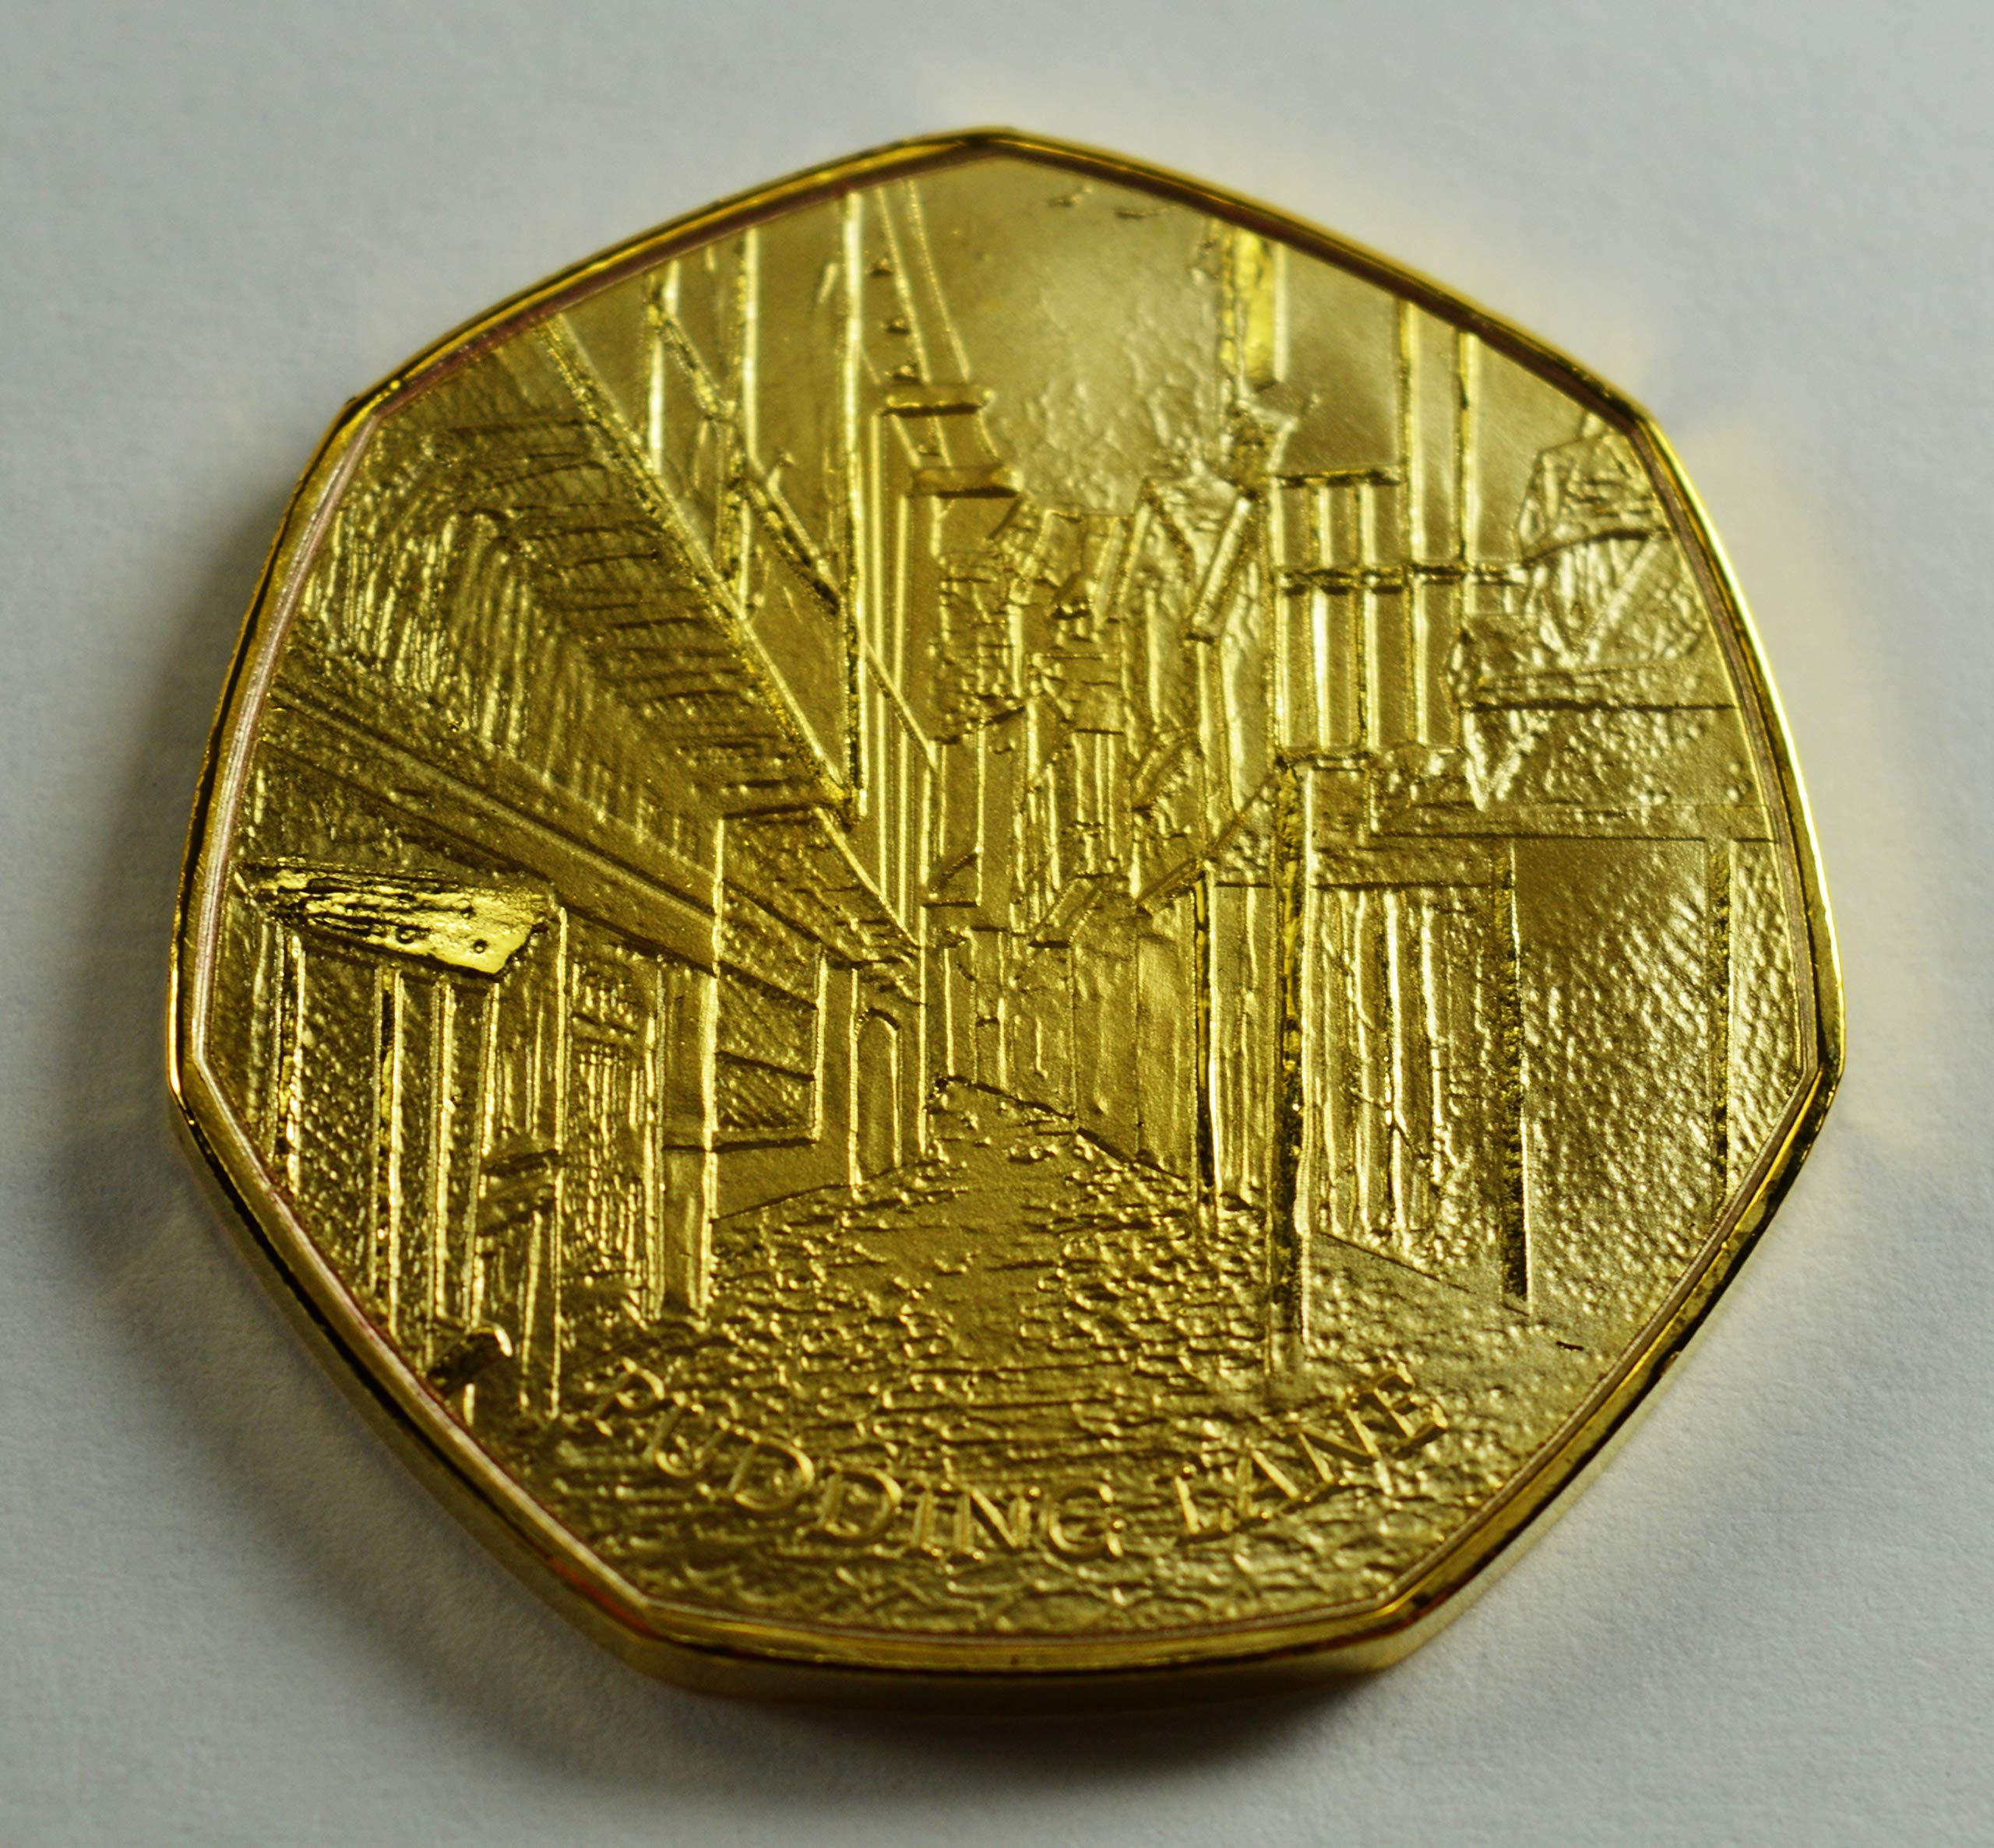 The Great Fire of London 1666 - Álbumes de Monedas conmemorativos de Oro de 24 Quilates, coleccionistas de 50p, Caza de Monedas. Pudín de Pesca: Amazon.es: Hogar